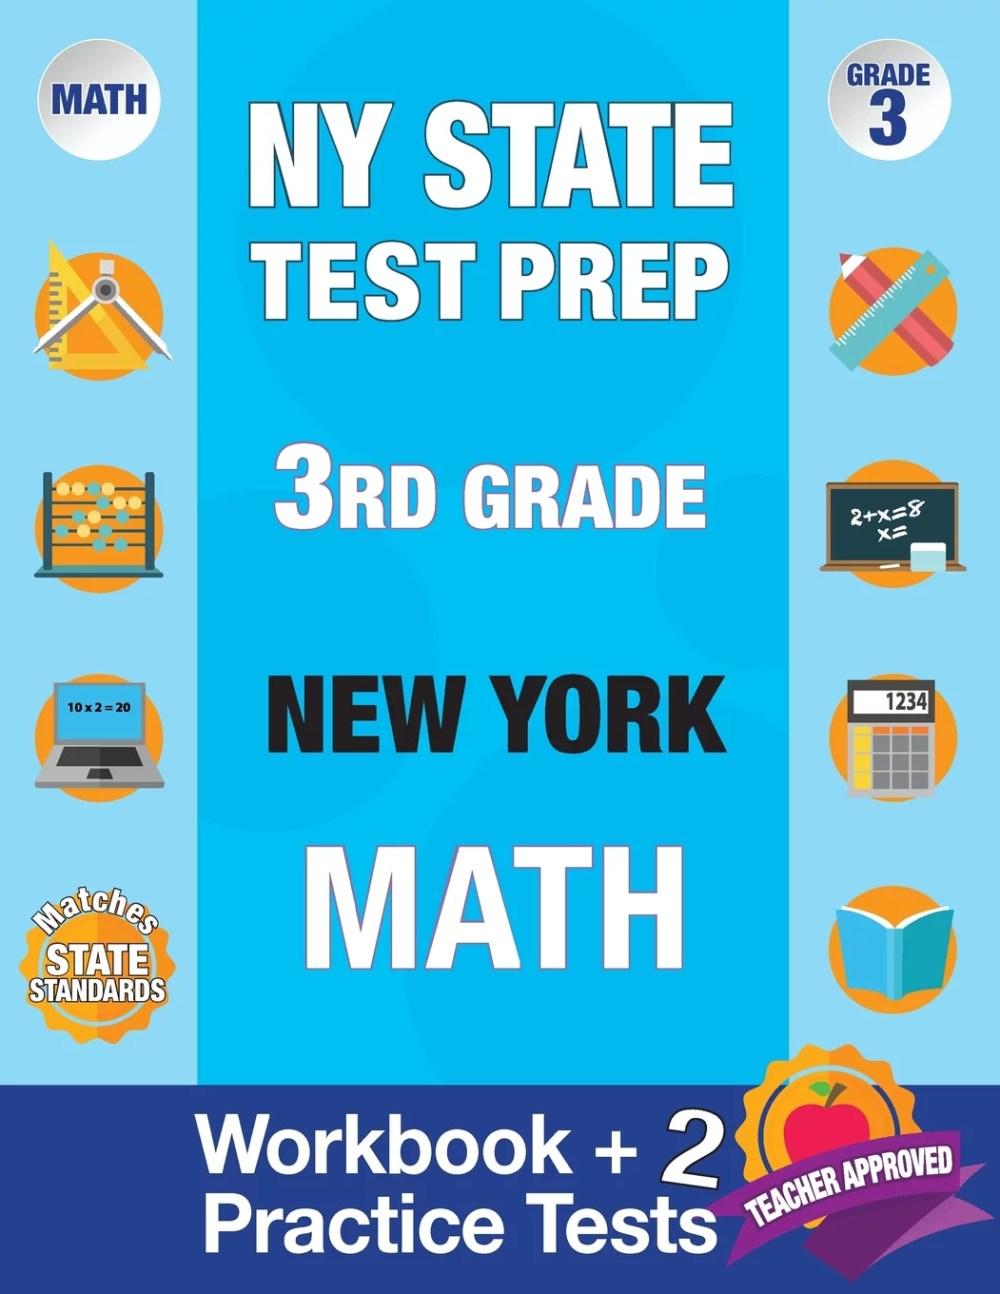 medium resolution of NY State Test Prep 3rd Grade New York Math : Workbook and 2 Practice Tests: New  York 3rd Grade Math Test Prep